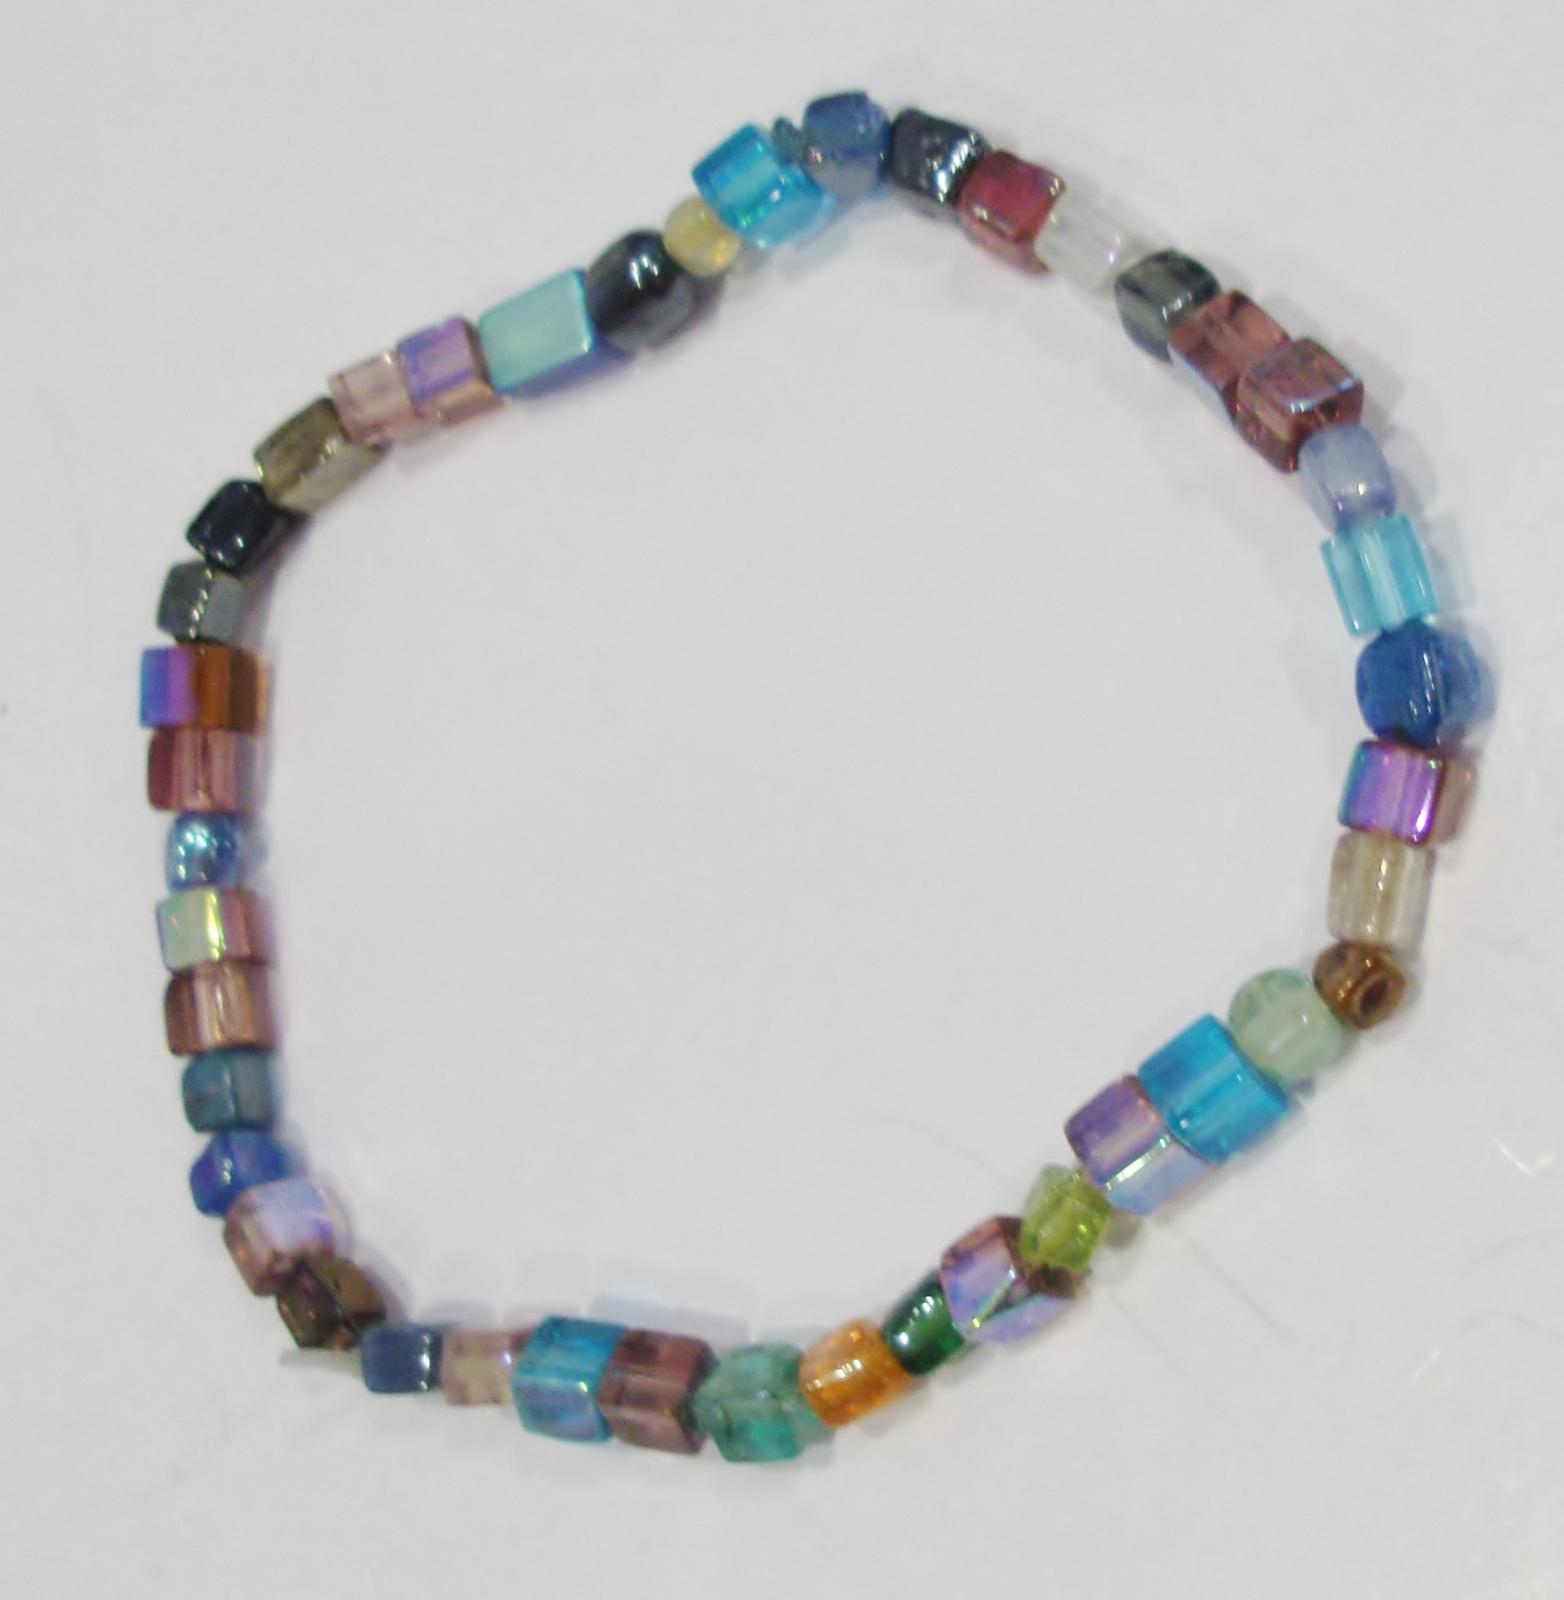 handmade multi-color square glass bead stretch bracelet